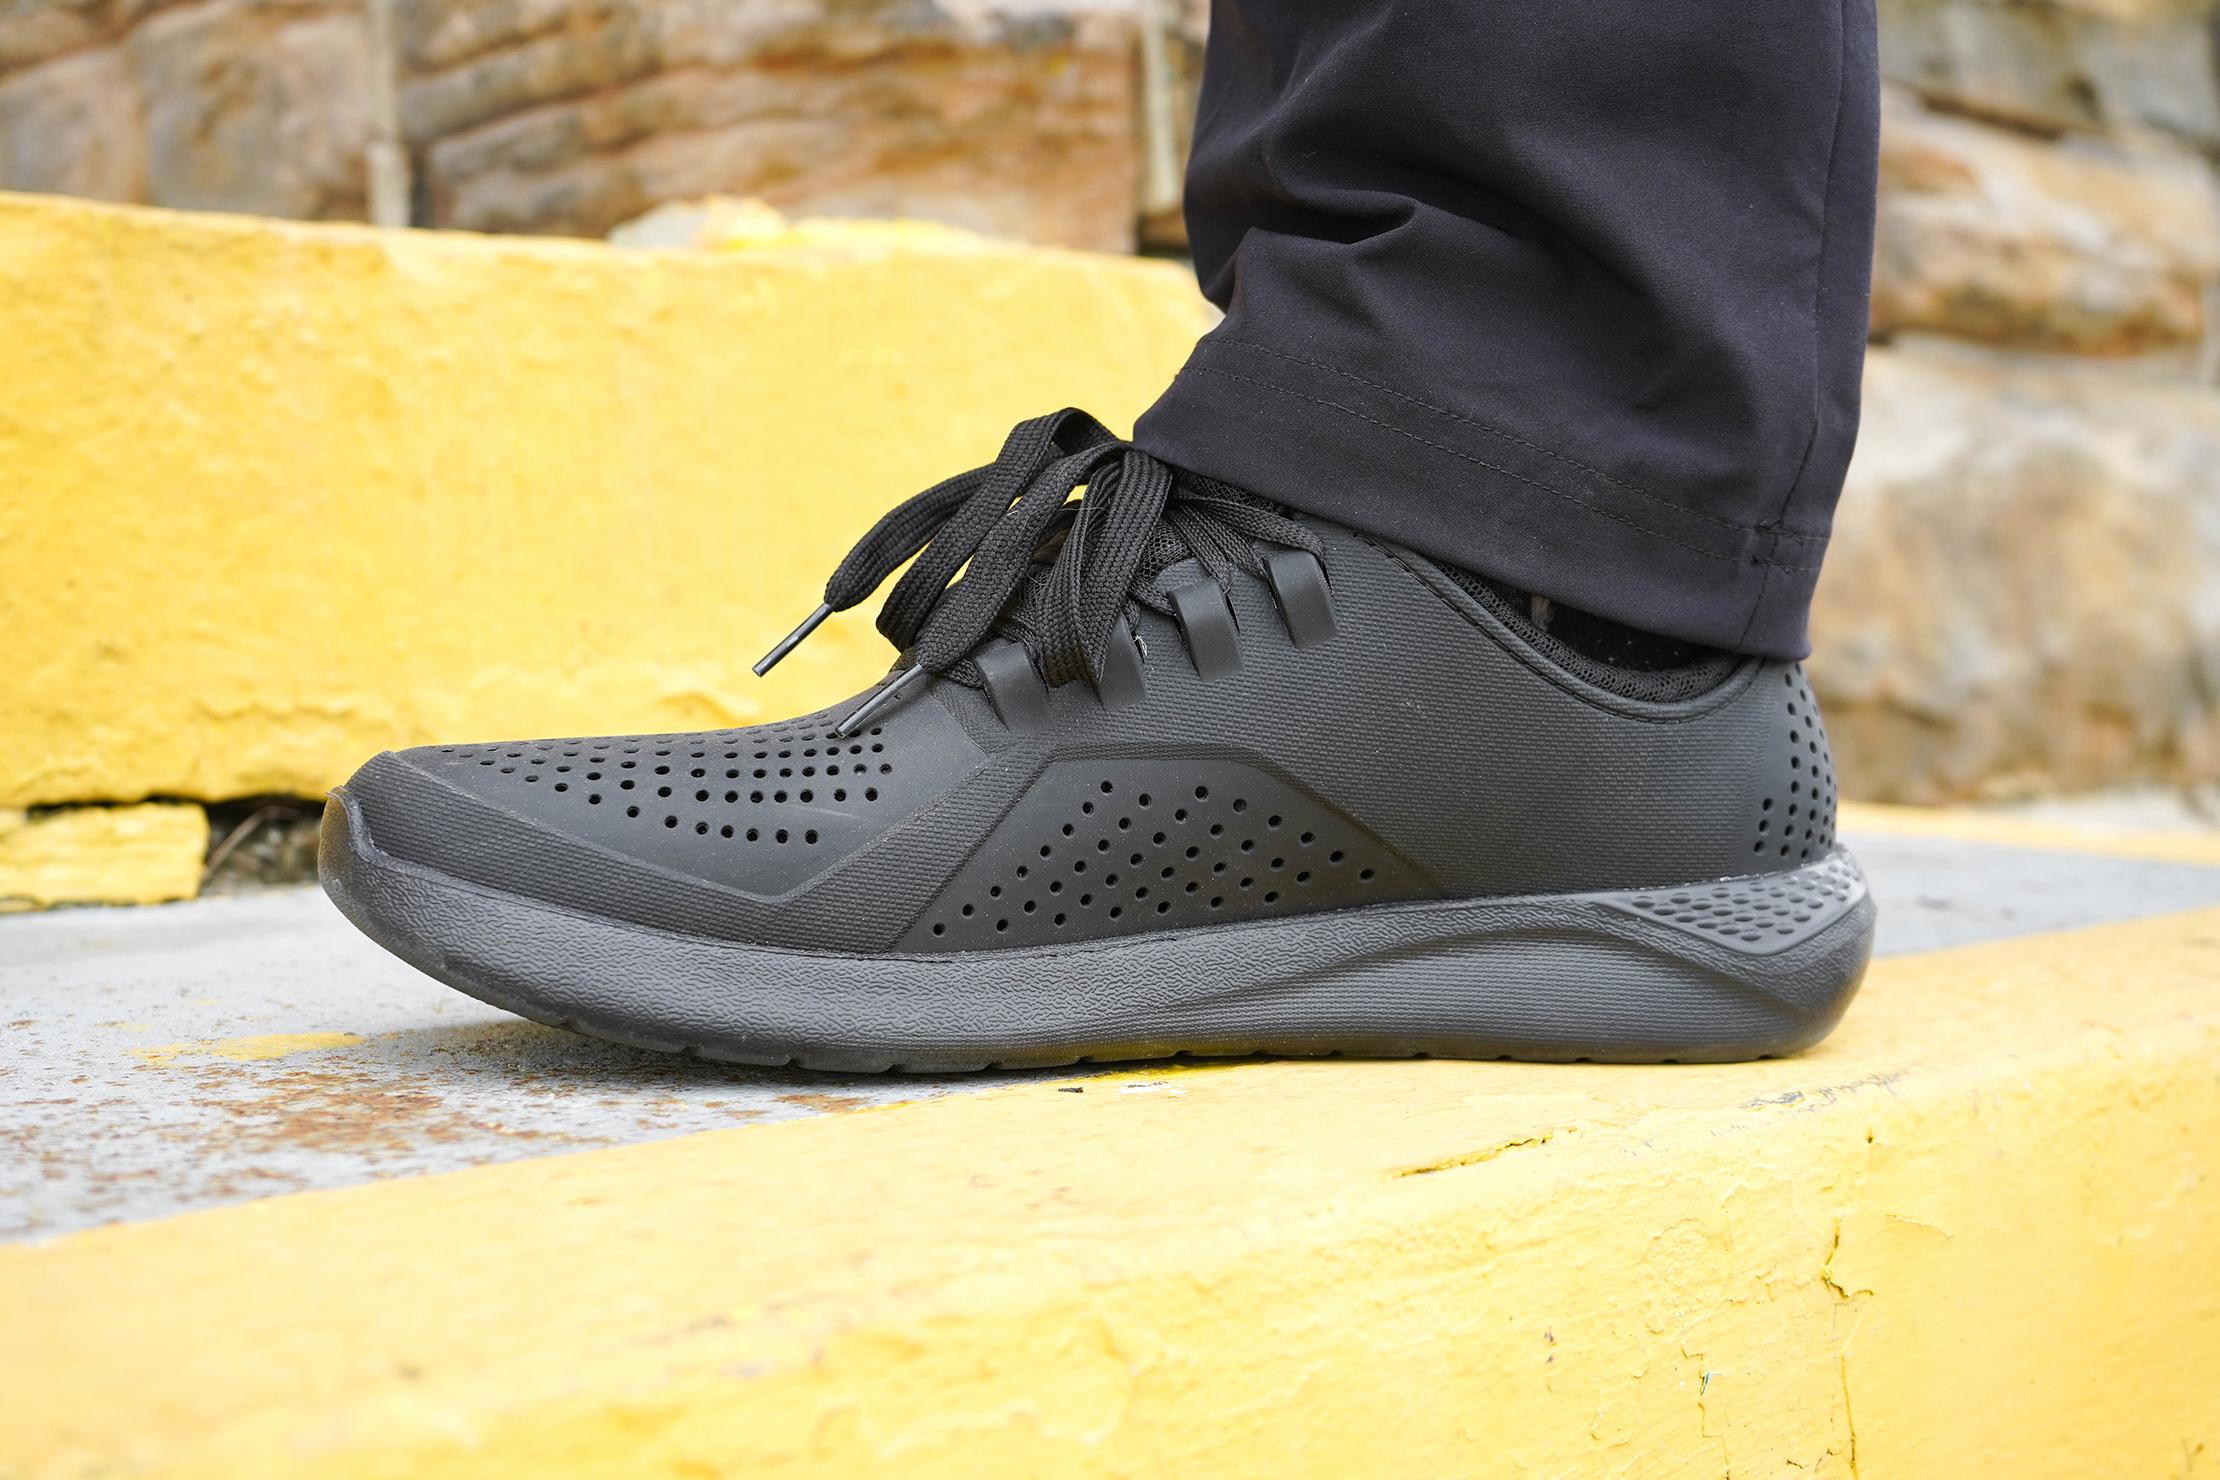 Crocs LiteRide Pacer Review | Pack Hacker